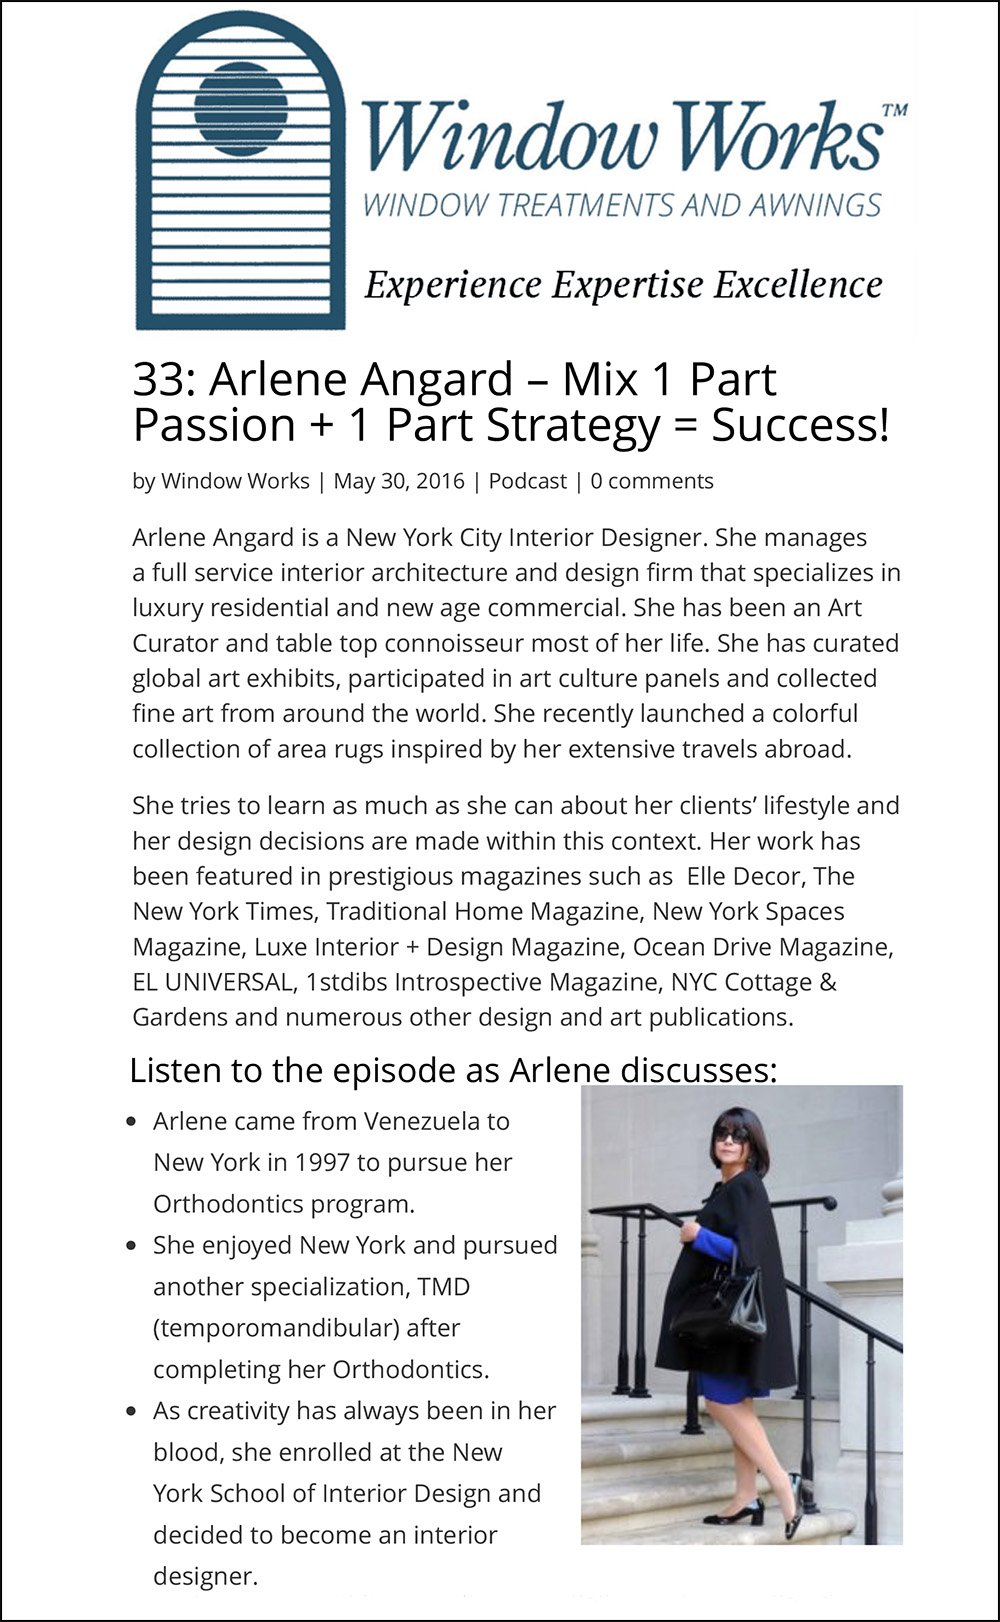 33: Arlene Angard – Mix 1 Part Passion + 1 Part Strategy = Suc